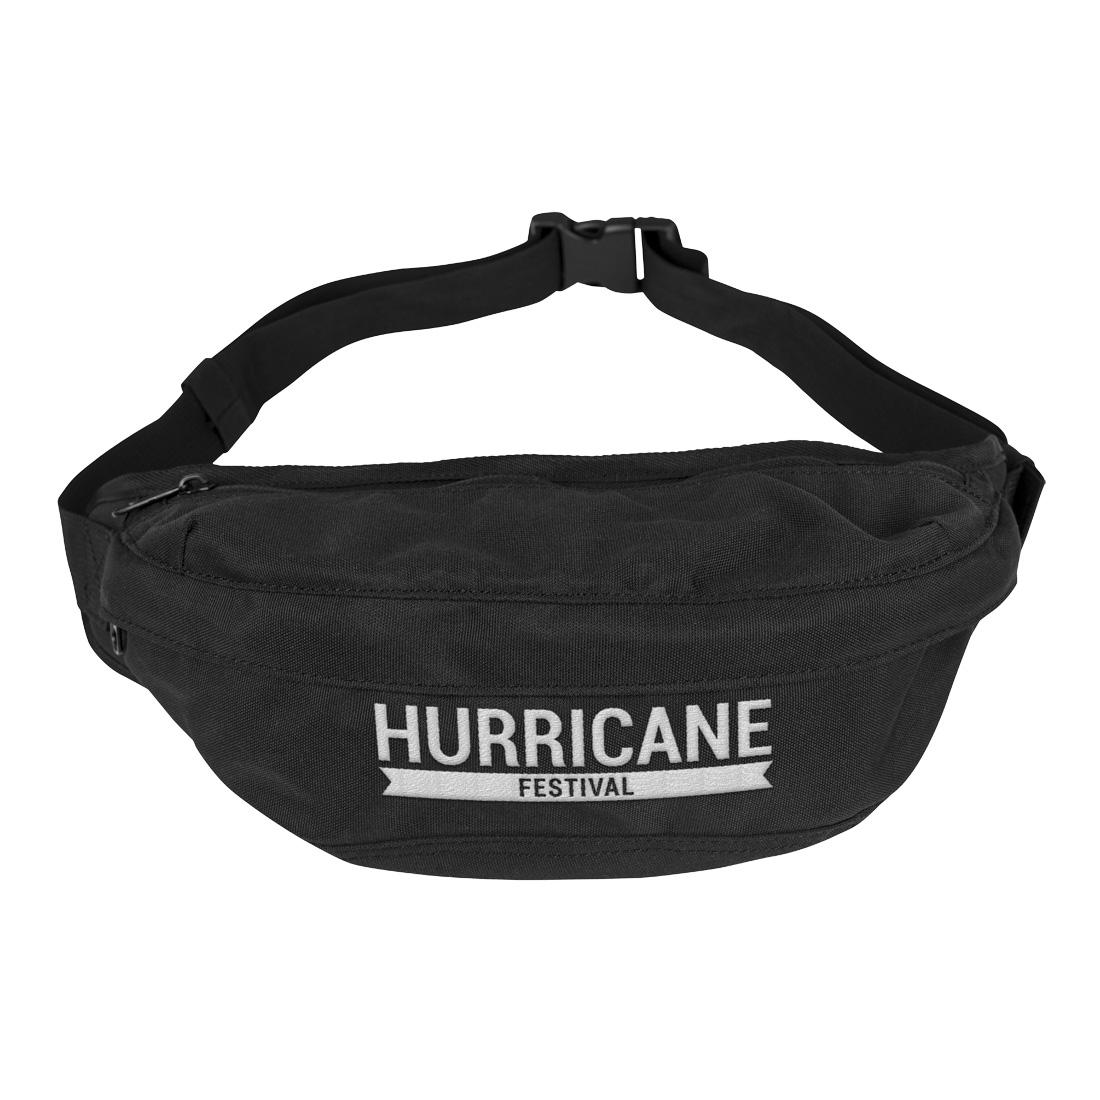 Logo von Hurricane Festival - Shoulder Bag jetzt im My Festival Shop Shop